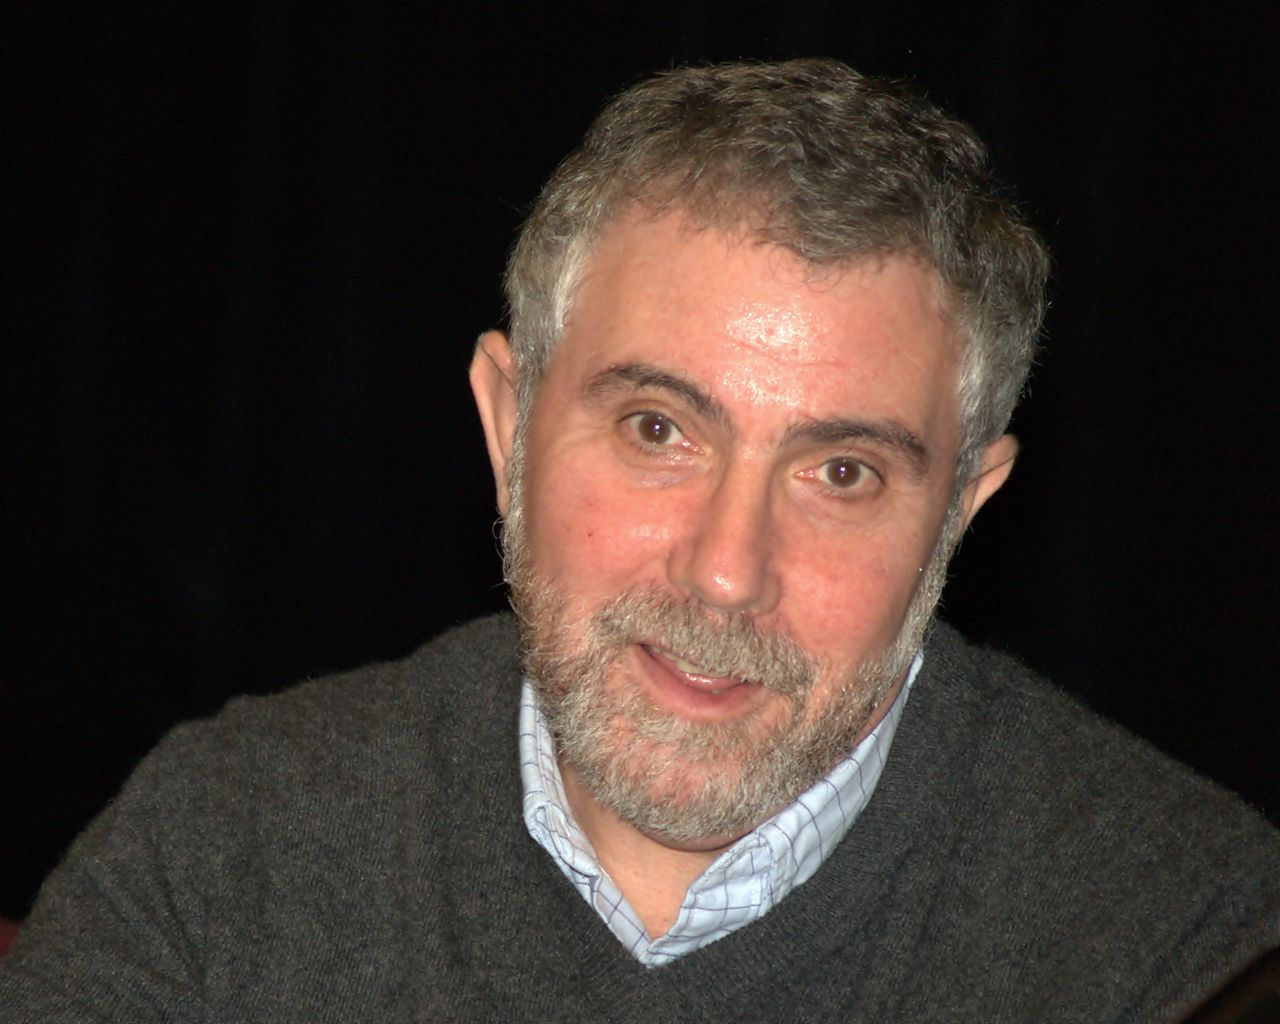 Paul Krugman (Wikipedia)